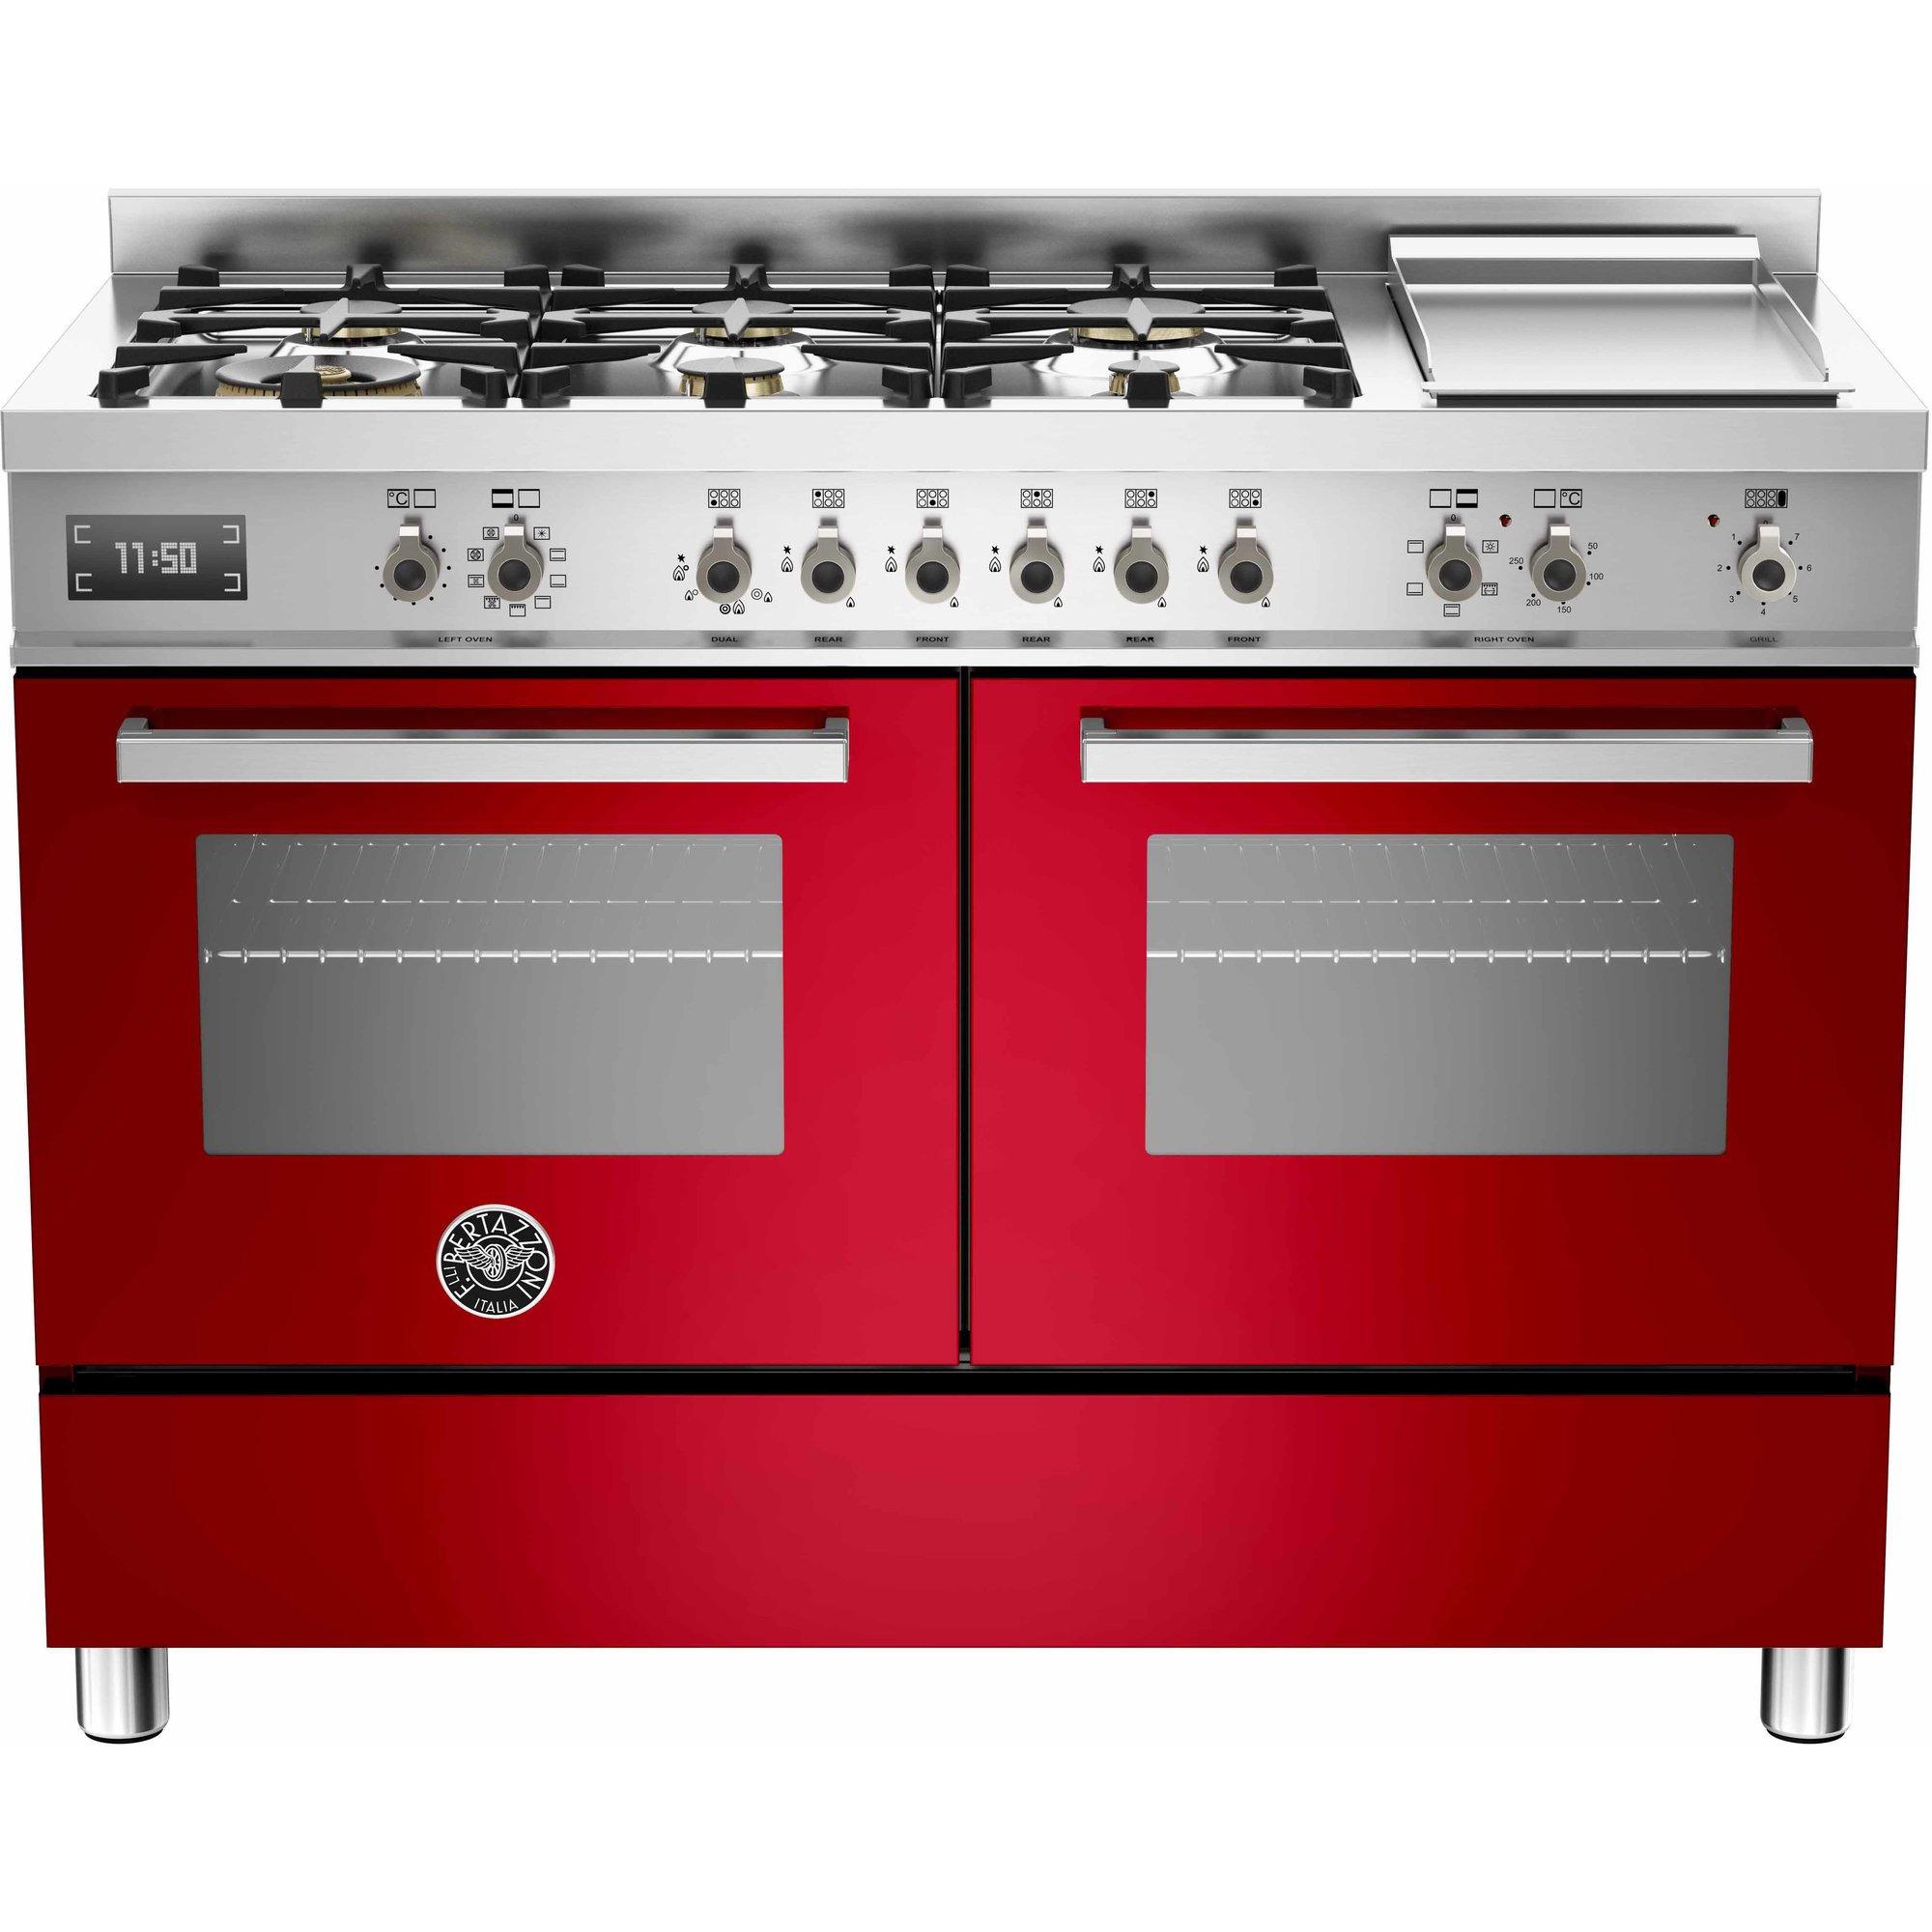 Bertazzoni PRO1206 Gasspis 120 cm 2 ugnar 6 brännare + elektrisk tepanyaki röd